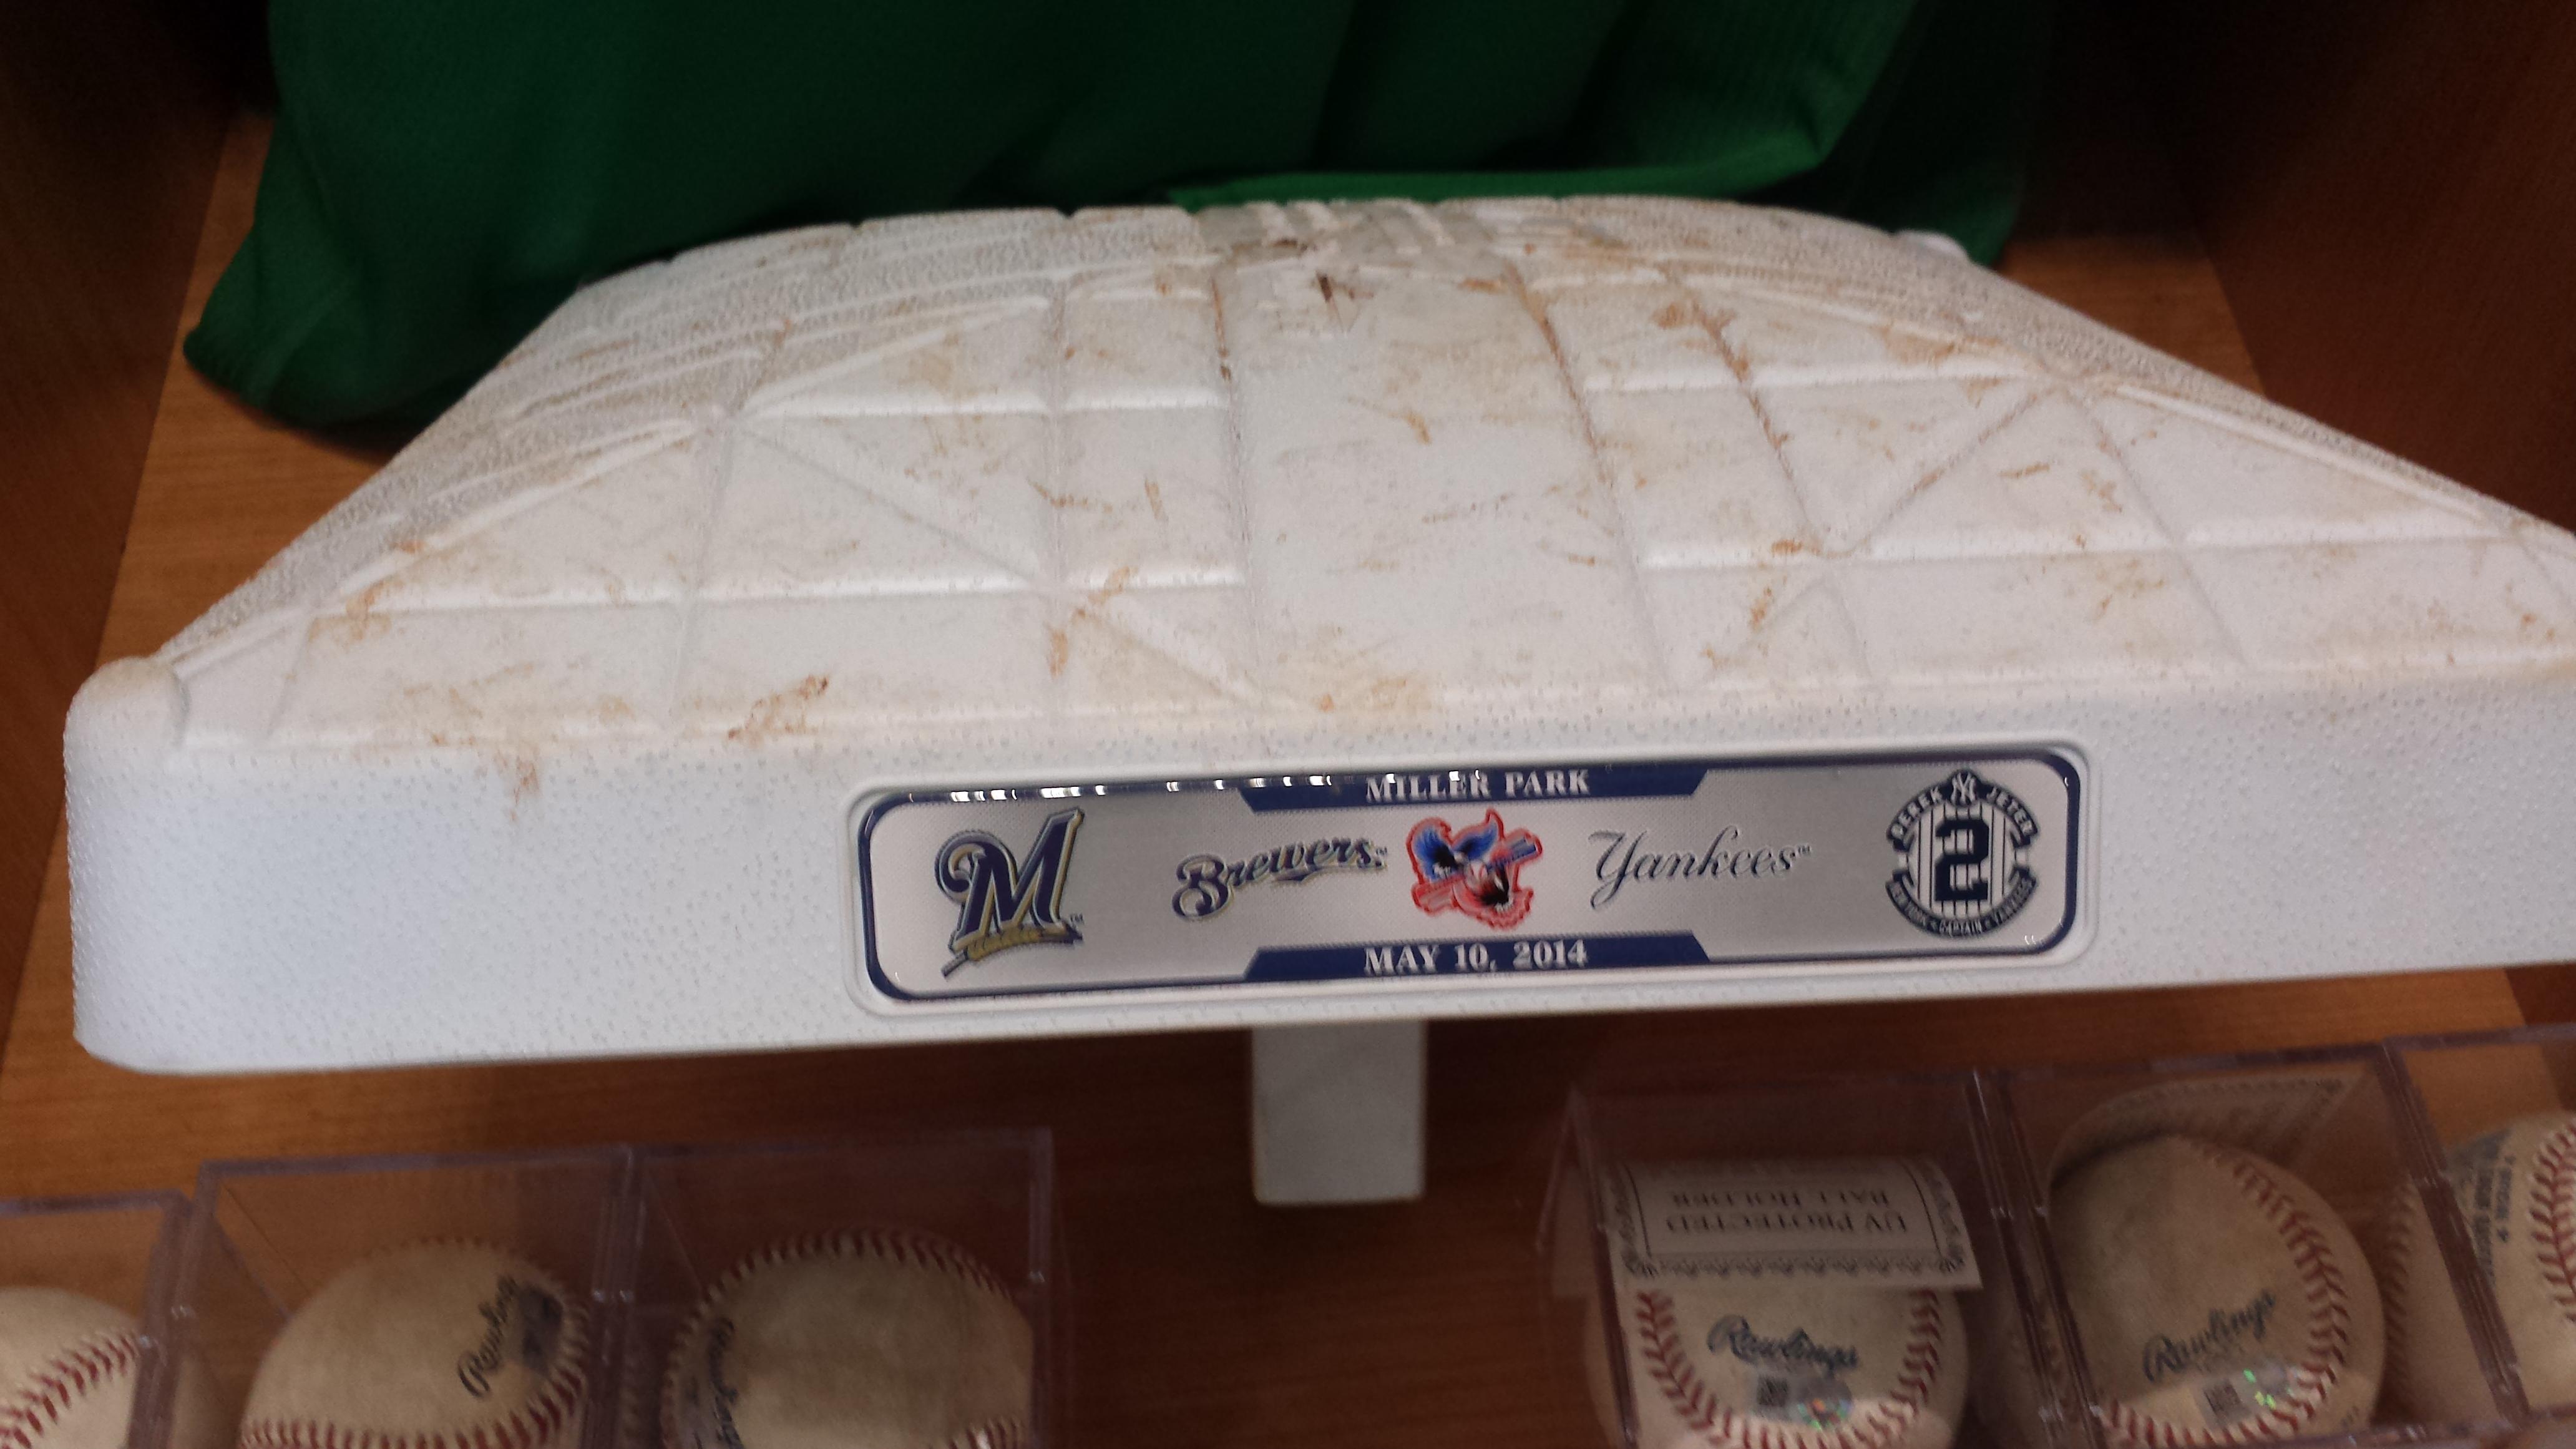 Brewers vs Yankees game used base